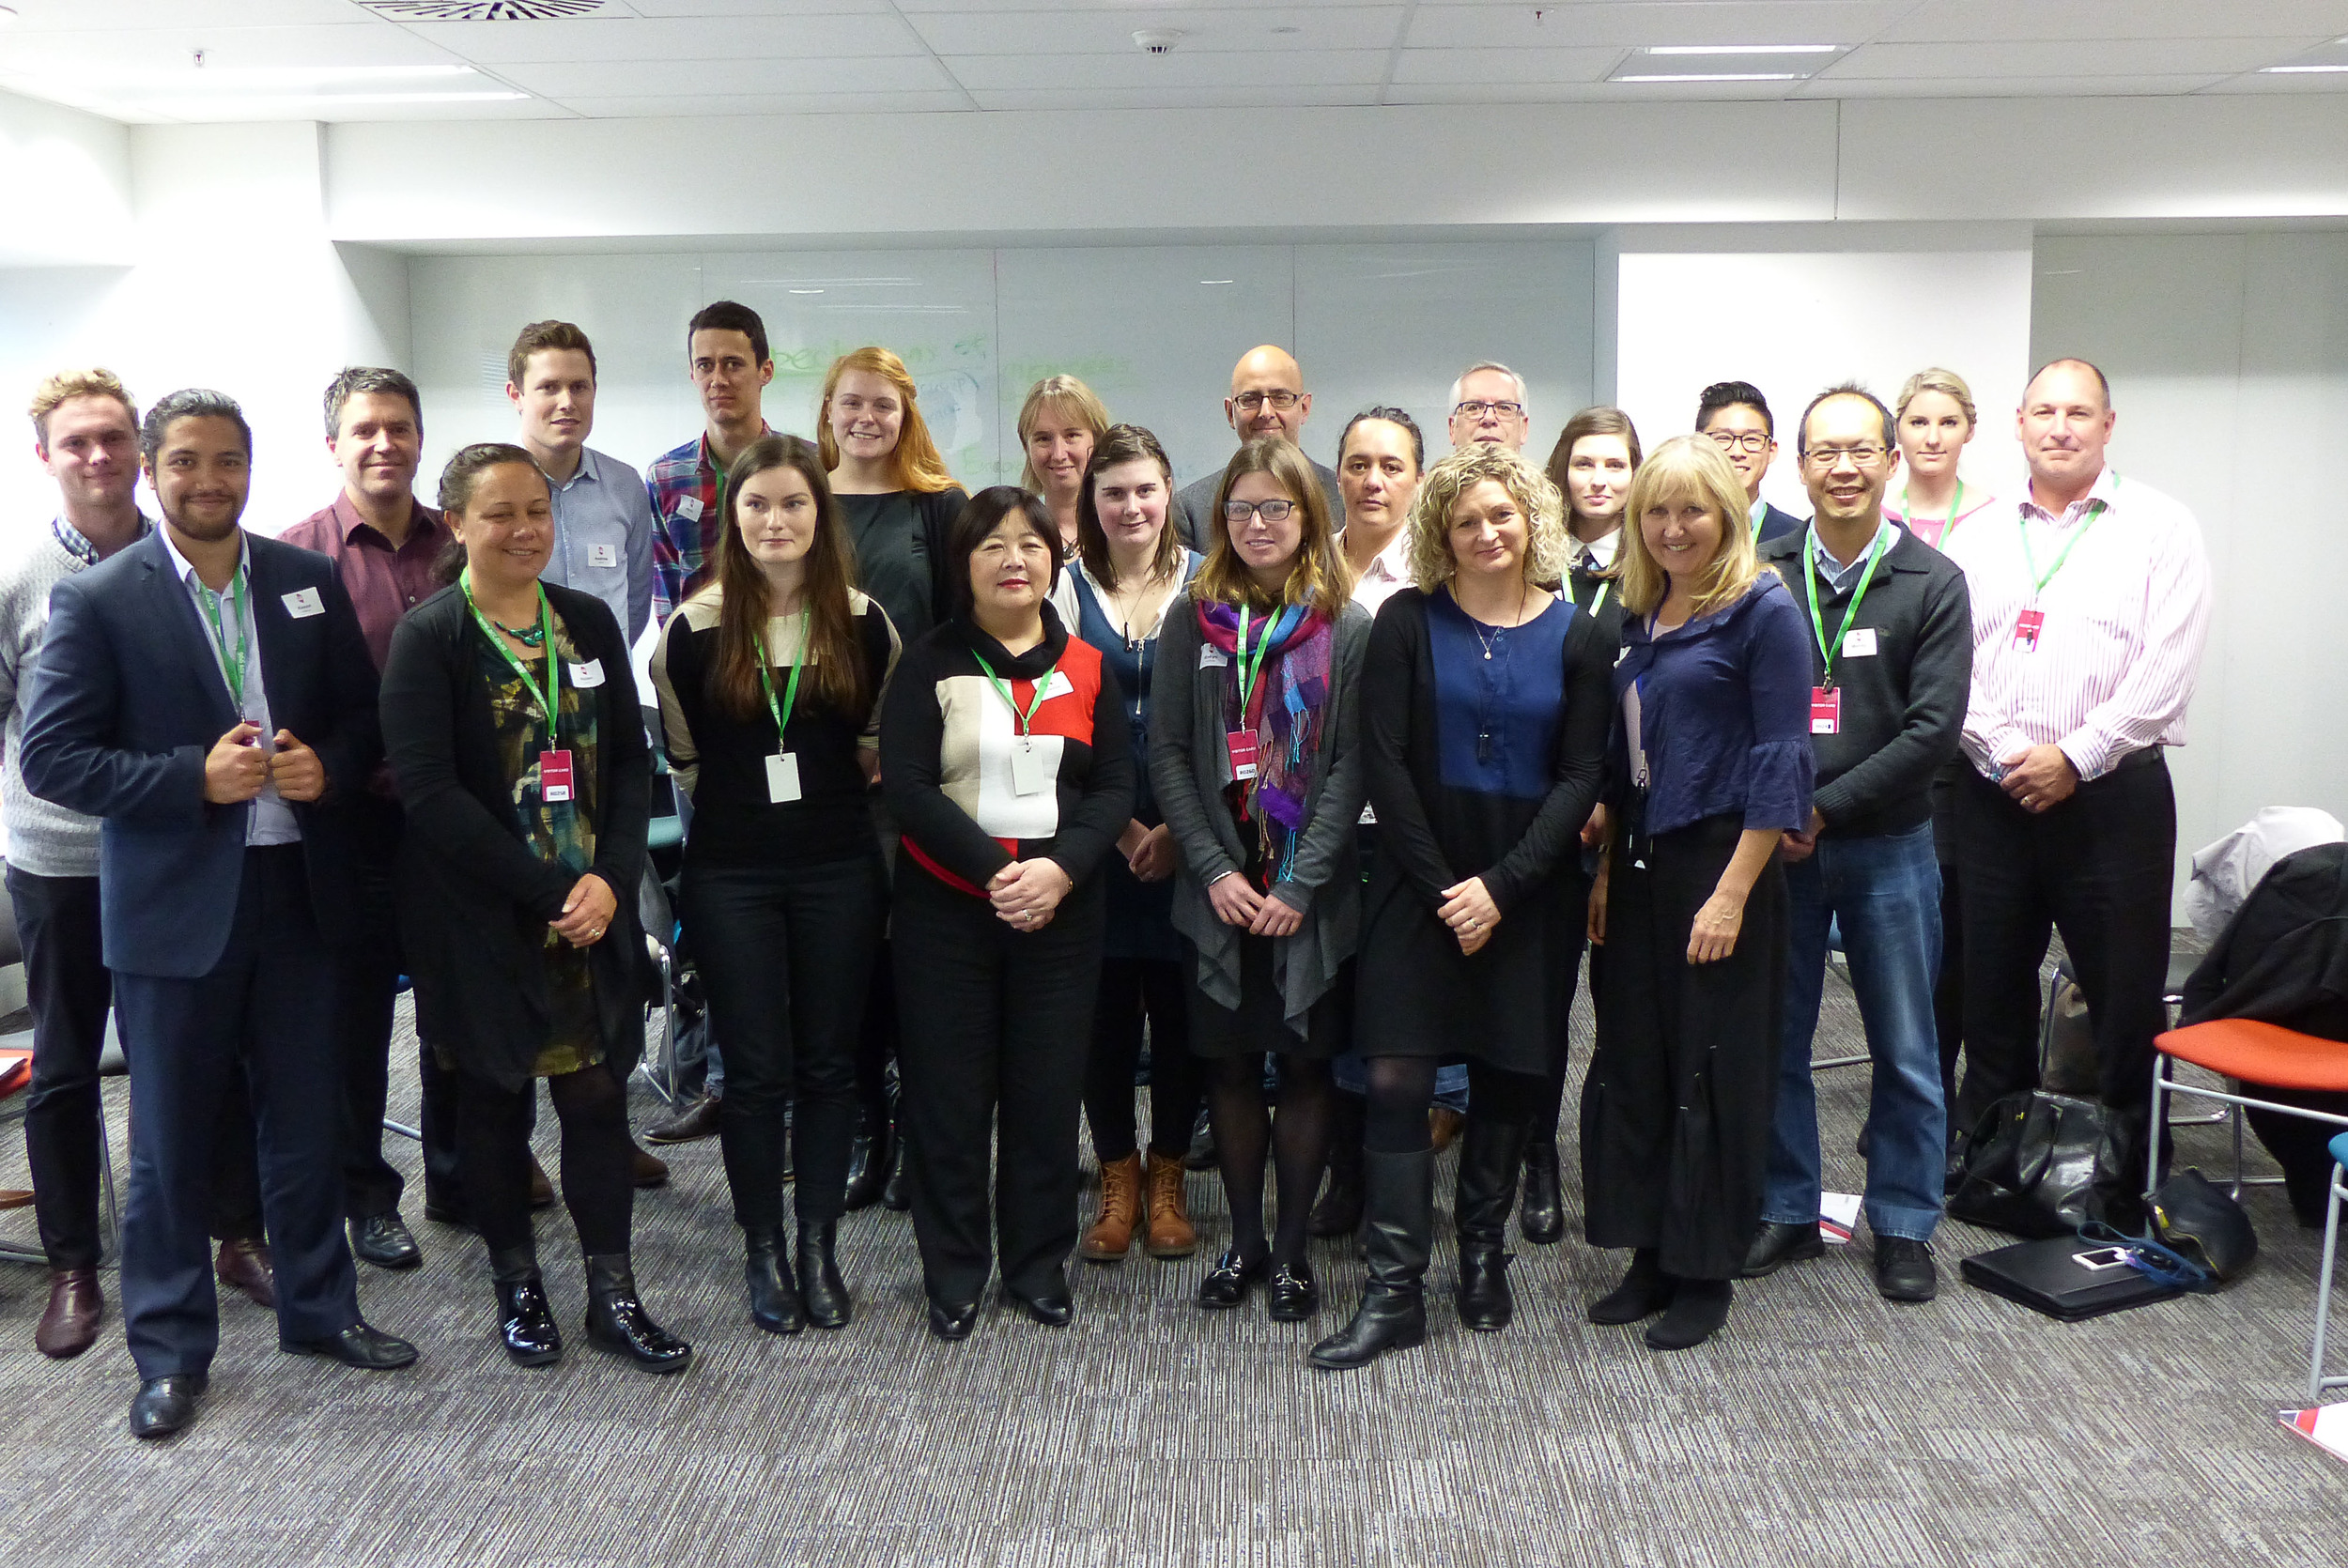 Mentees & Mentors from Wellington & Dunedin